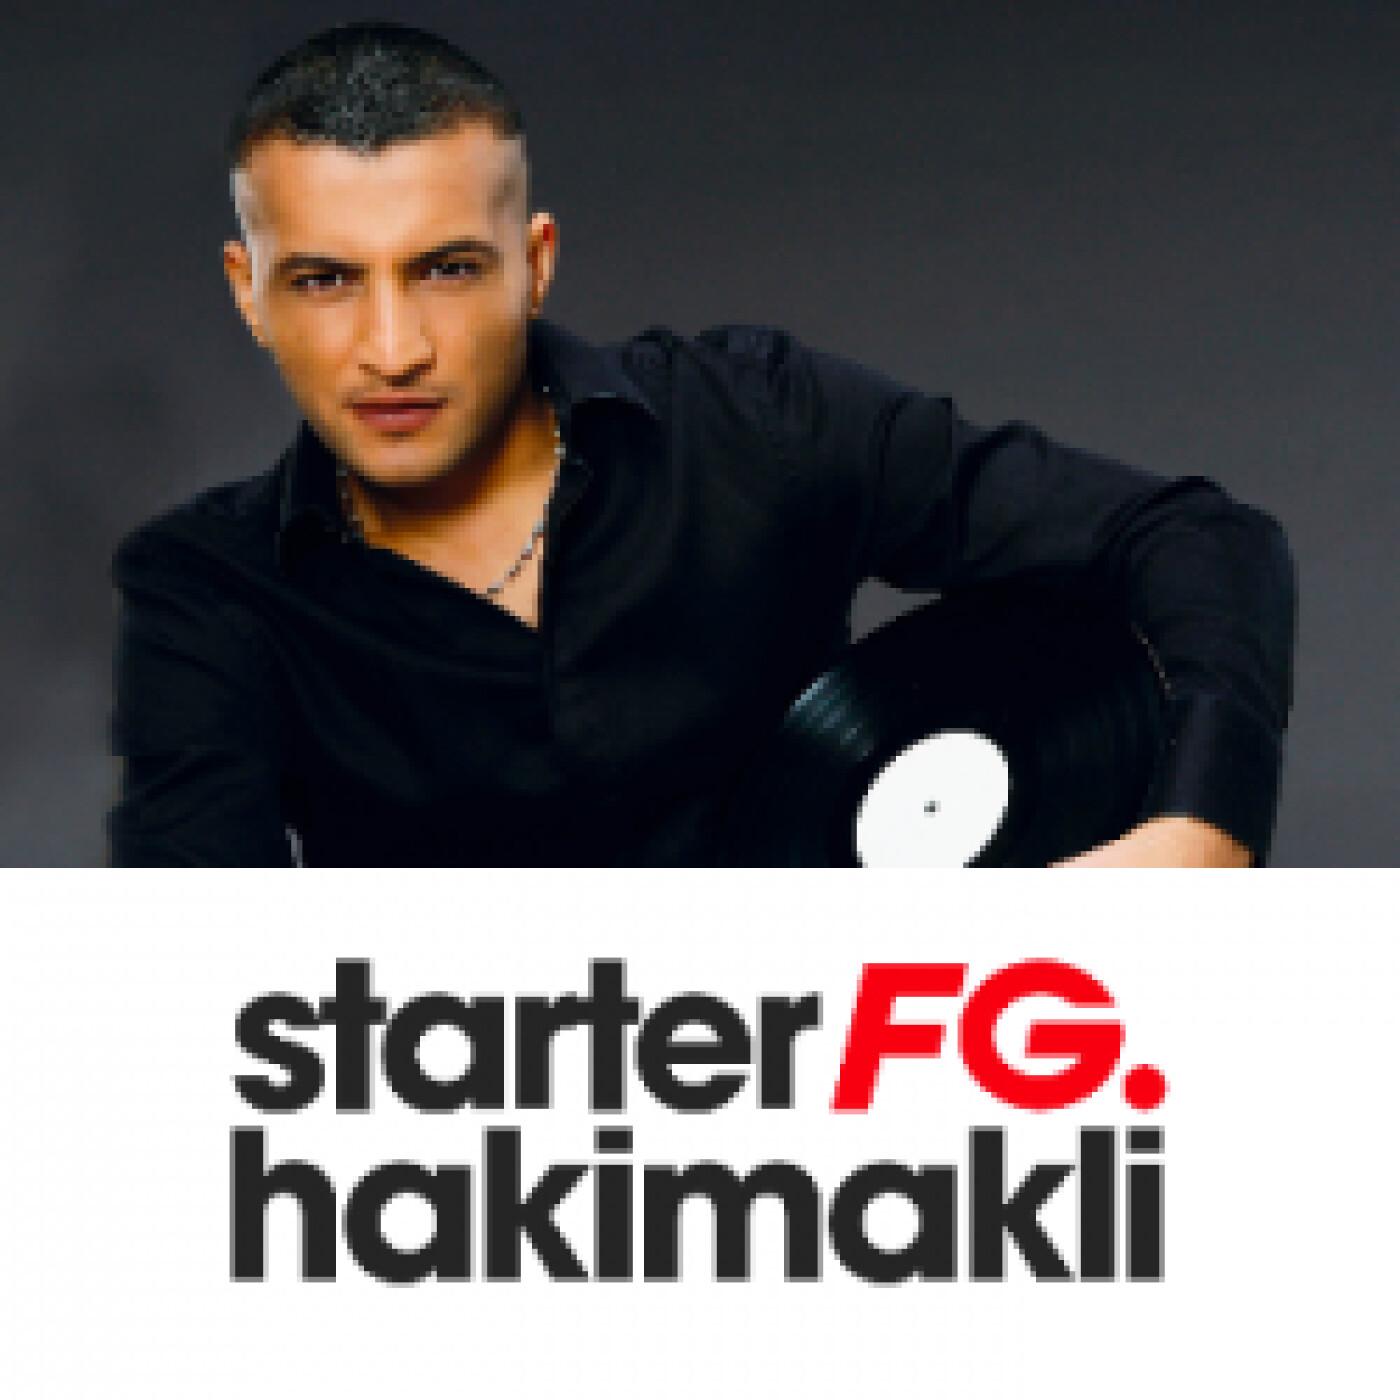 STARTER FG BY HAKIMAKLI MERCREDI 24 MARS 2021